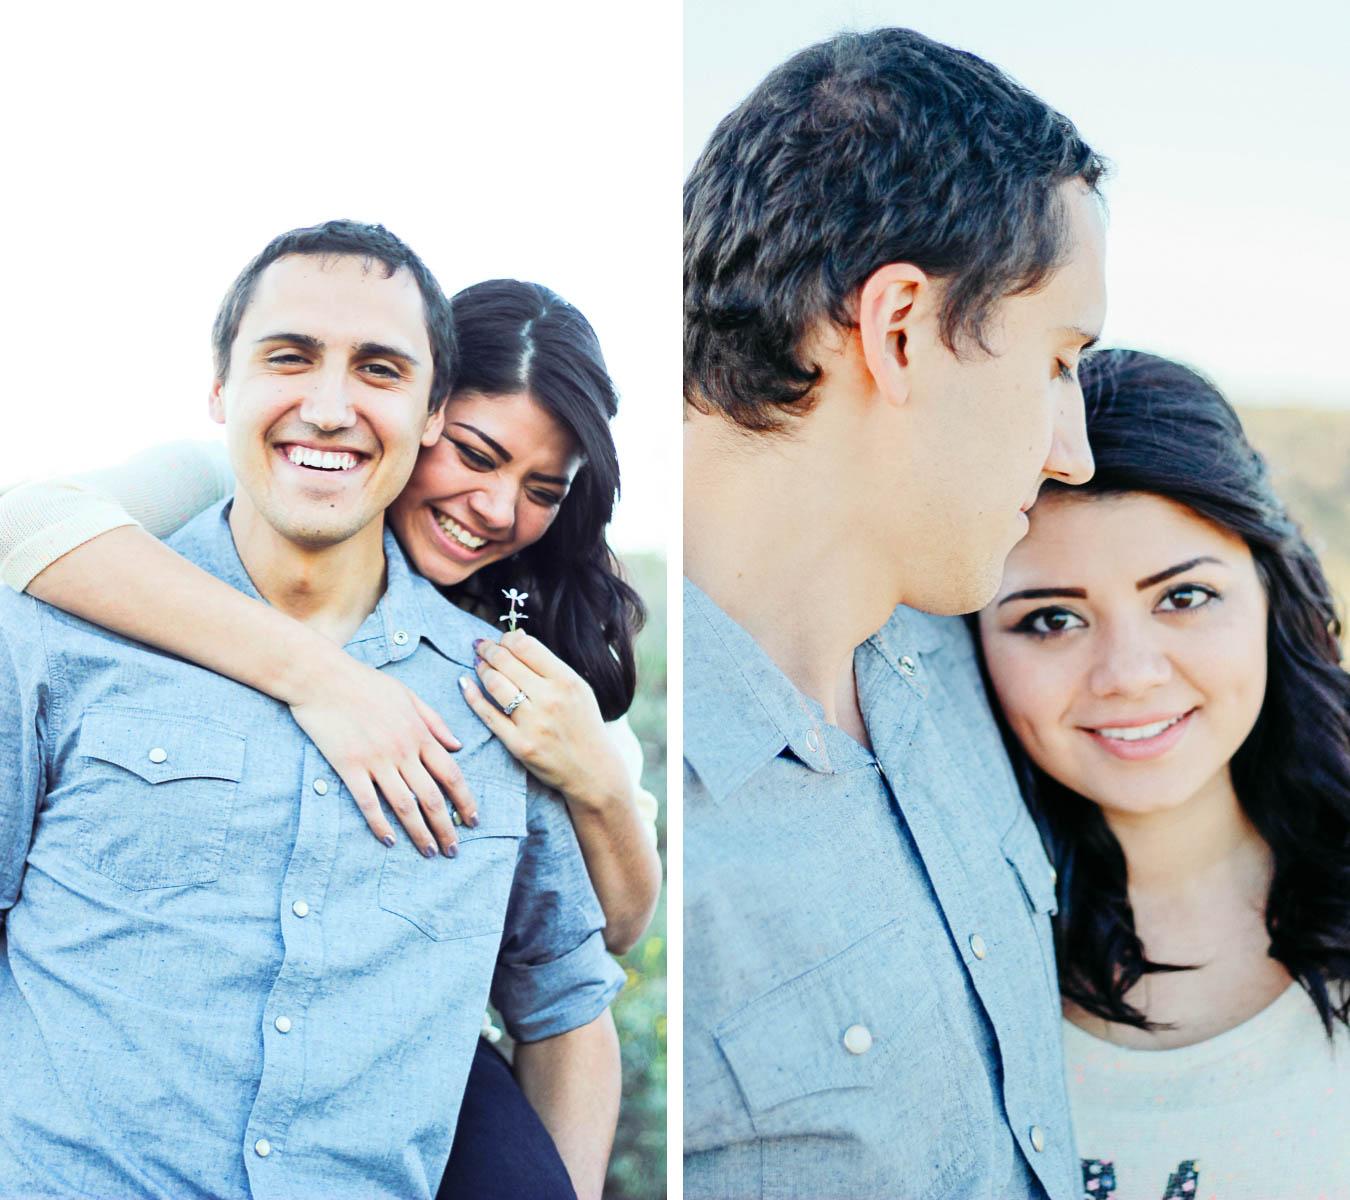 charlie-broc-couples-session-rexburg-idaho-chicago-engagement-photographer-claytonphotodesign-02.jpg